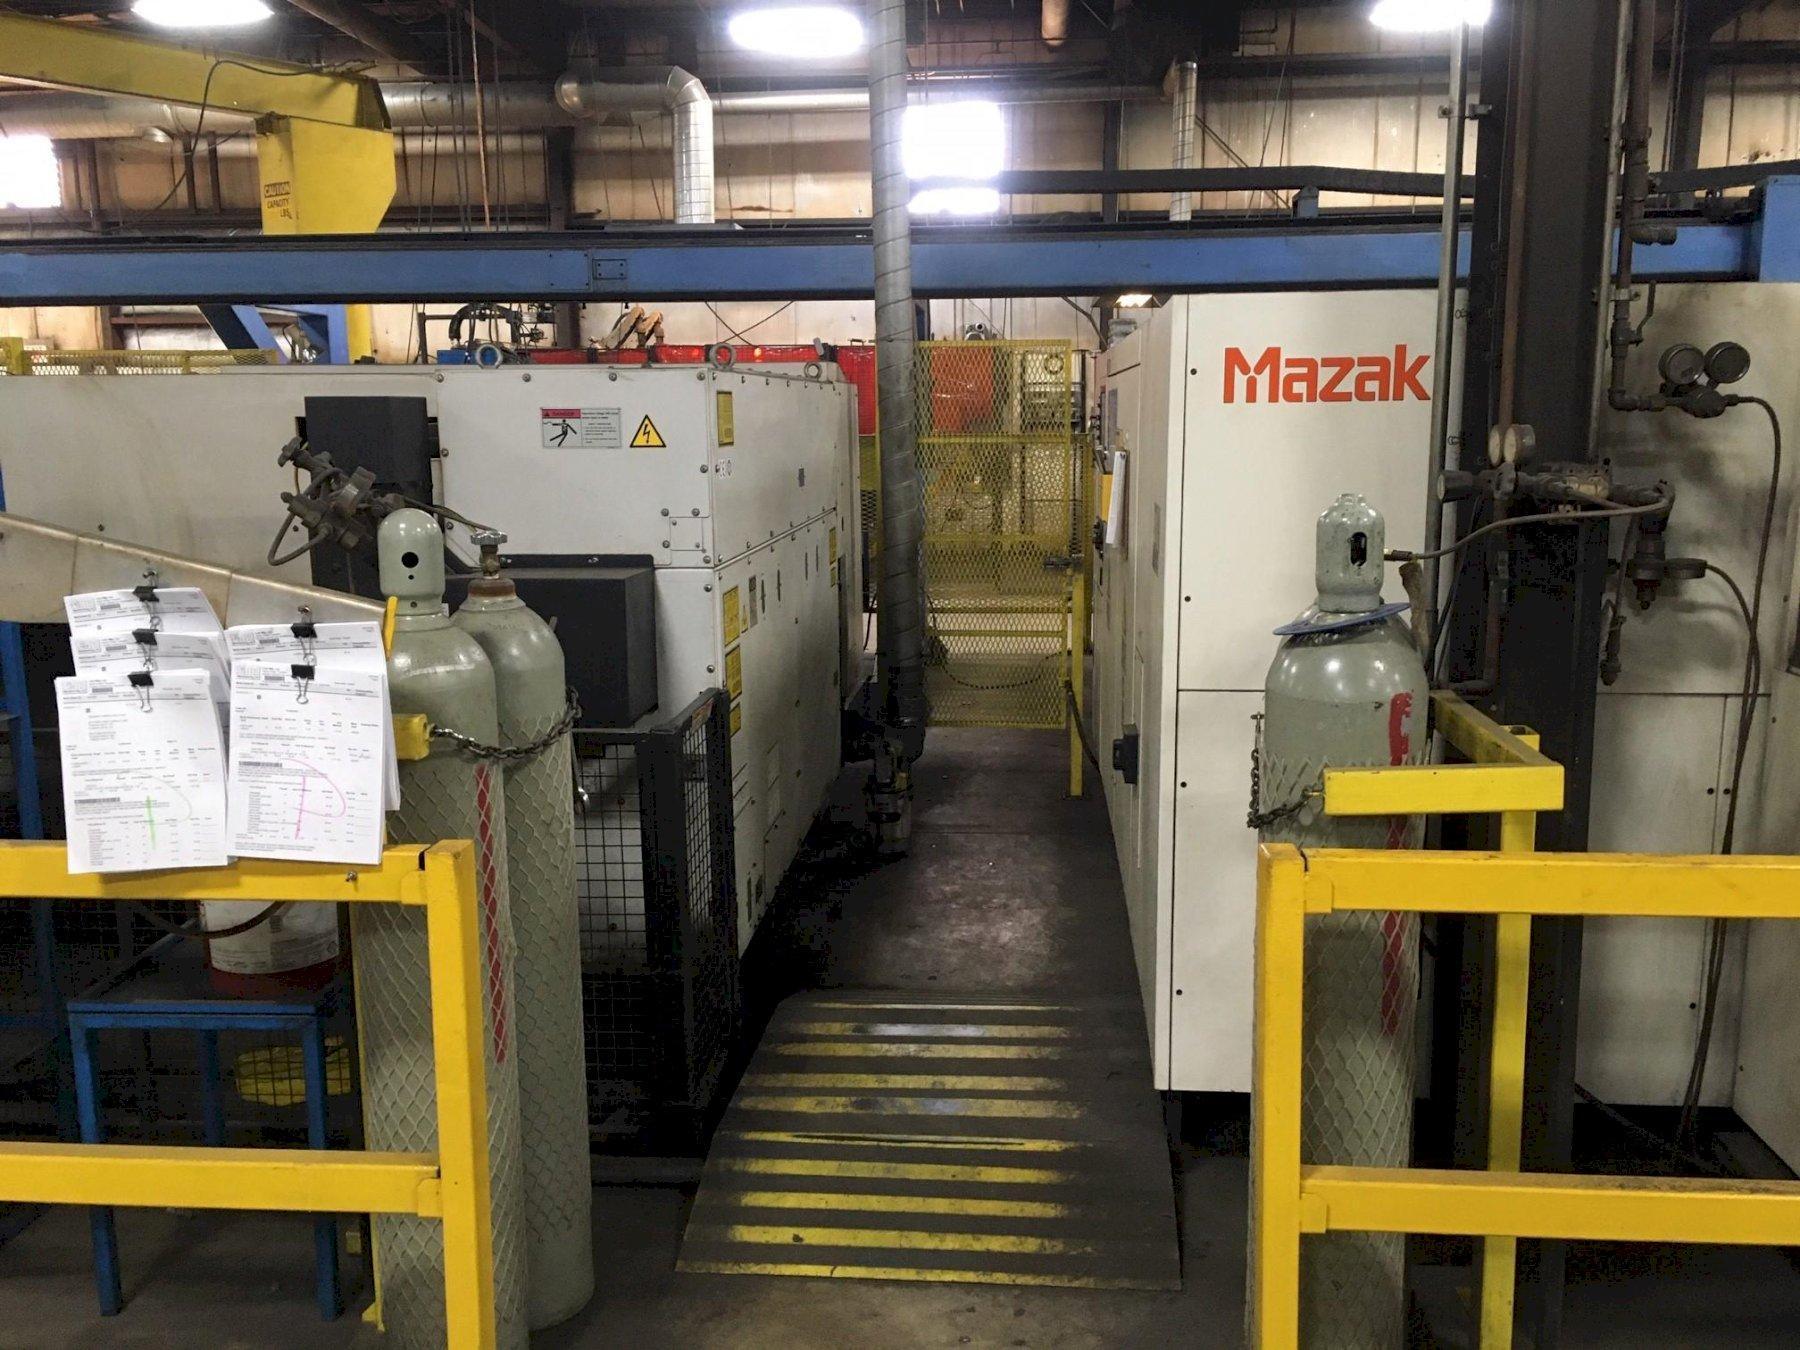 2007 Mazak STX510 Mark-II, 5x10, 2500 Watt Co2 CNC Laser